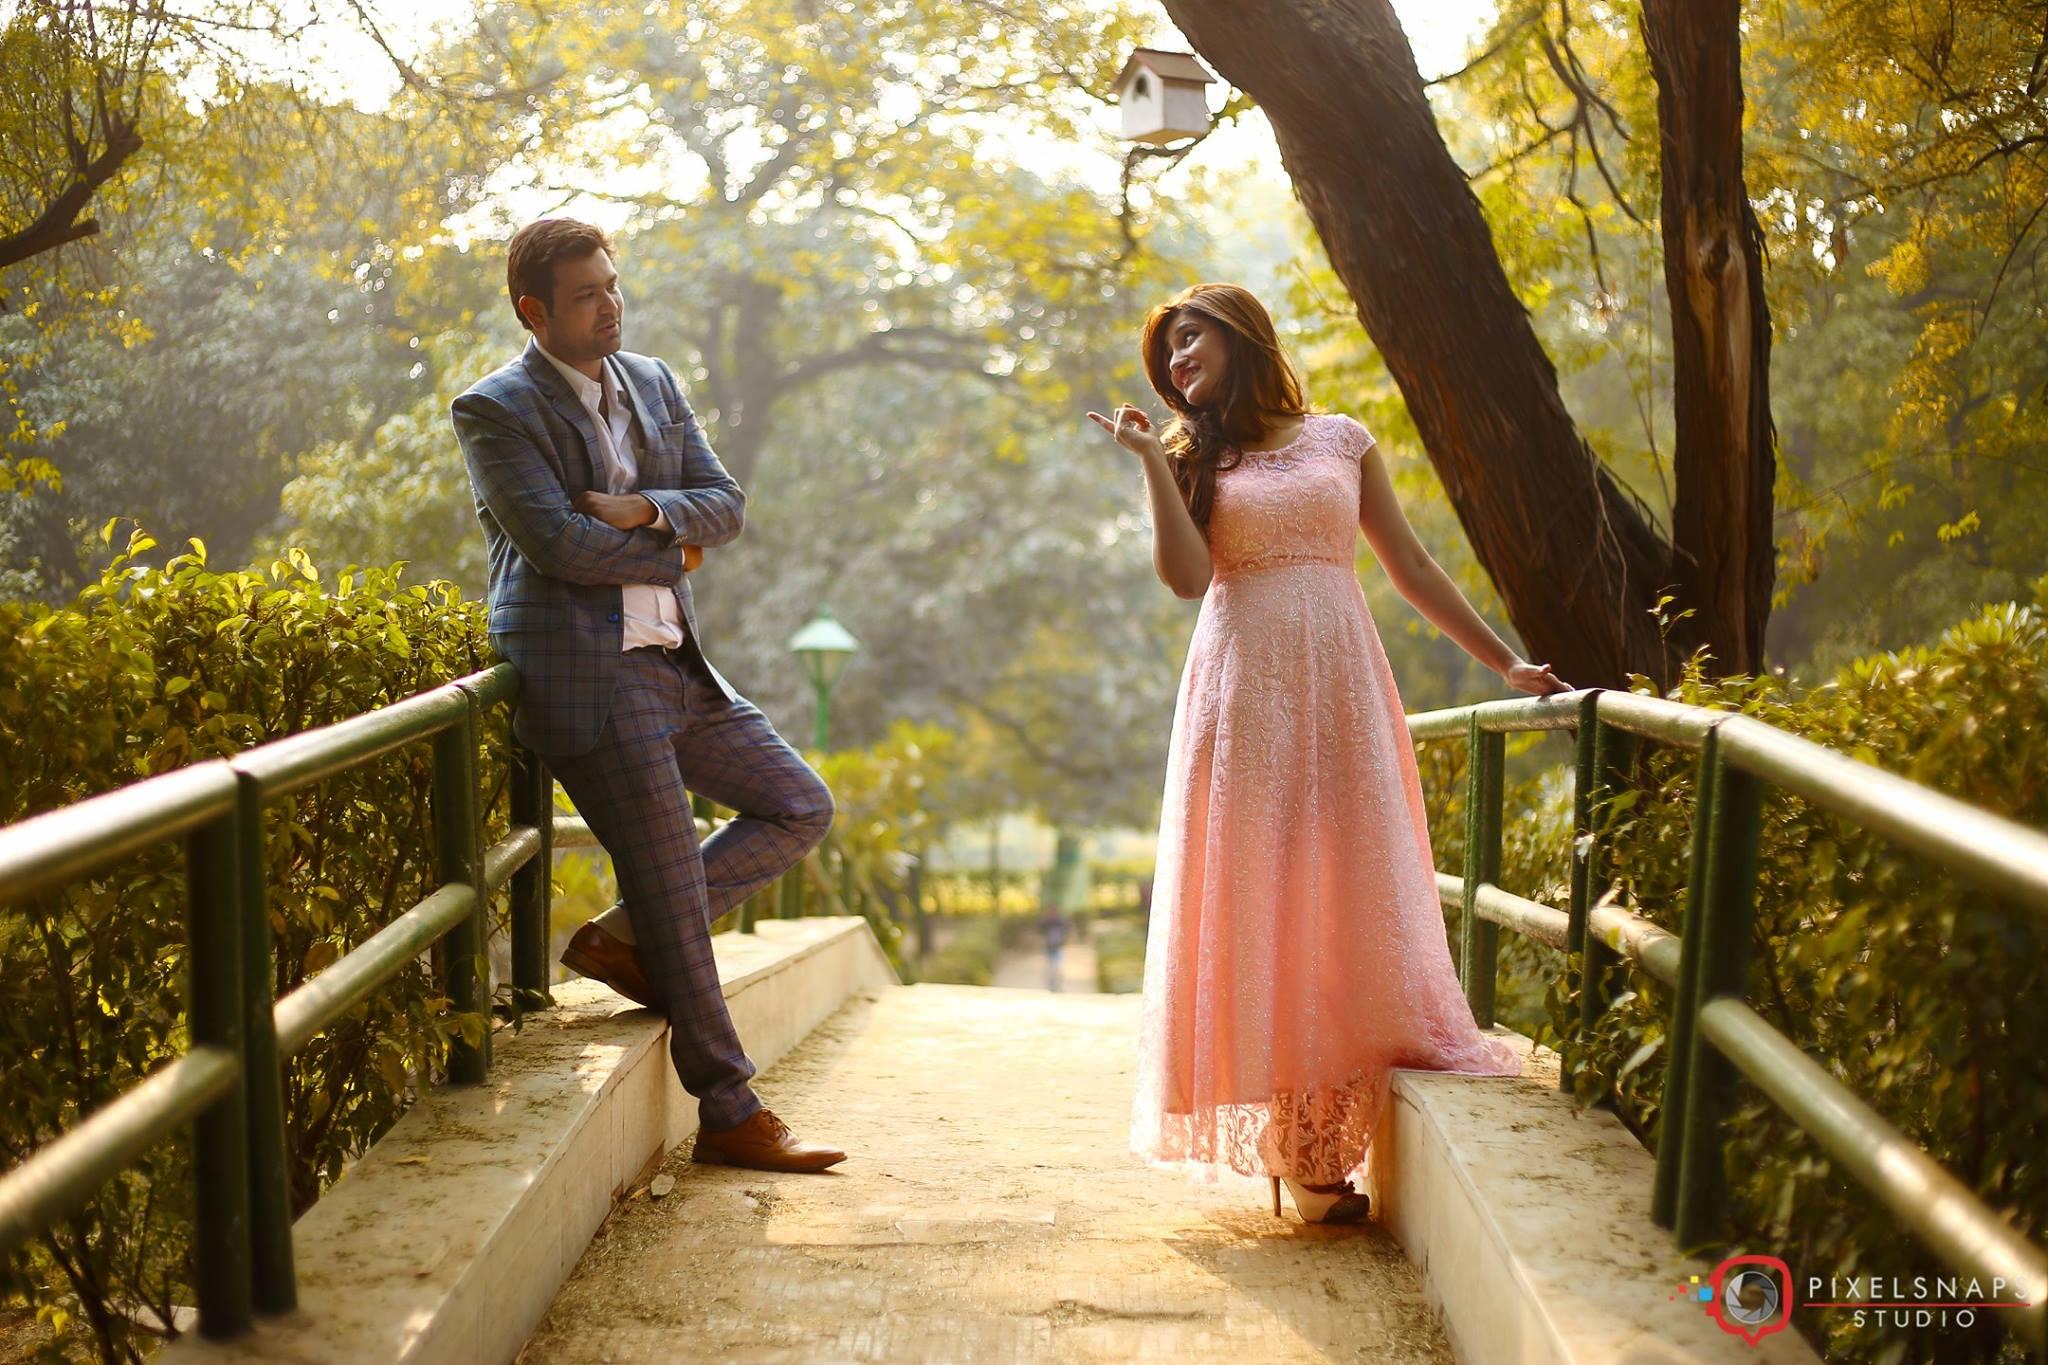 unique pre wedding photoshoot ideas